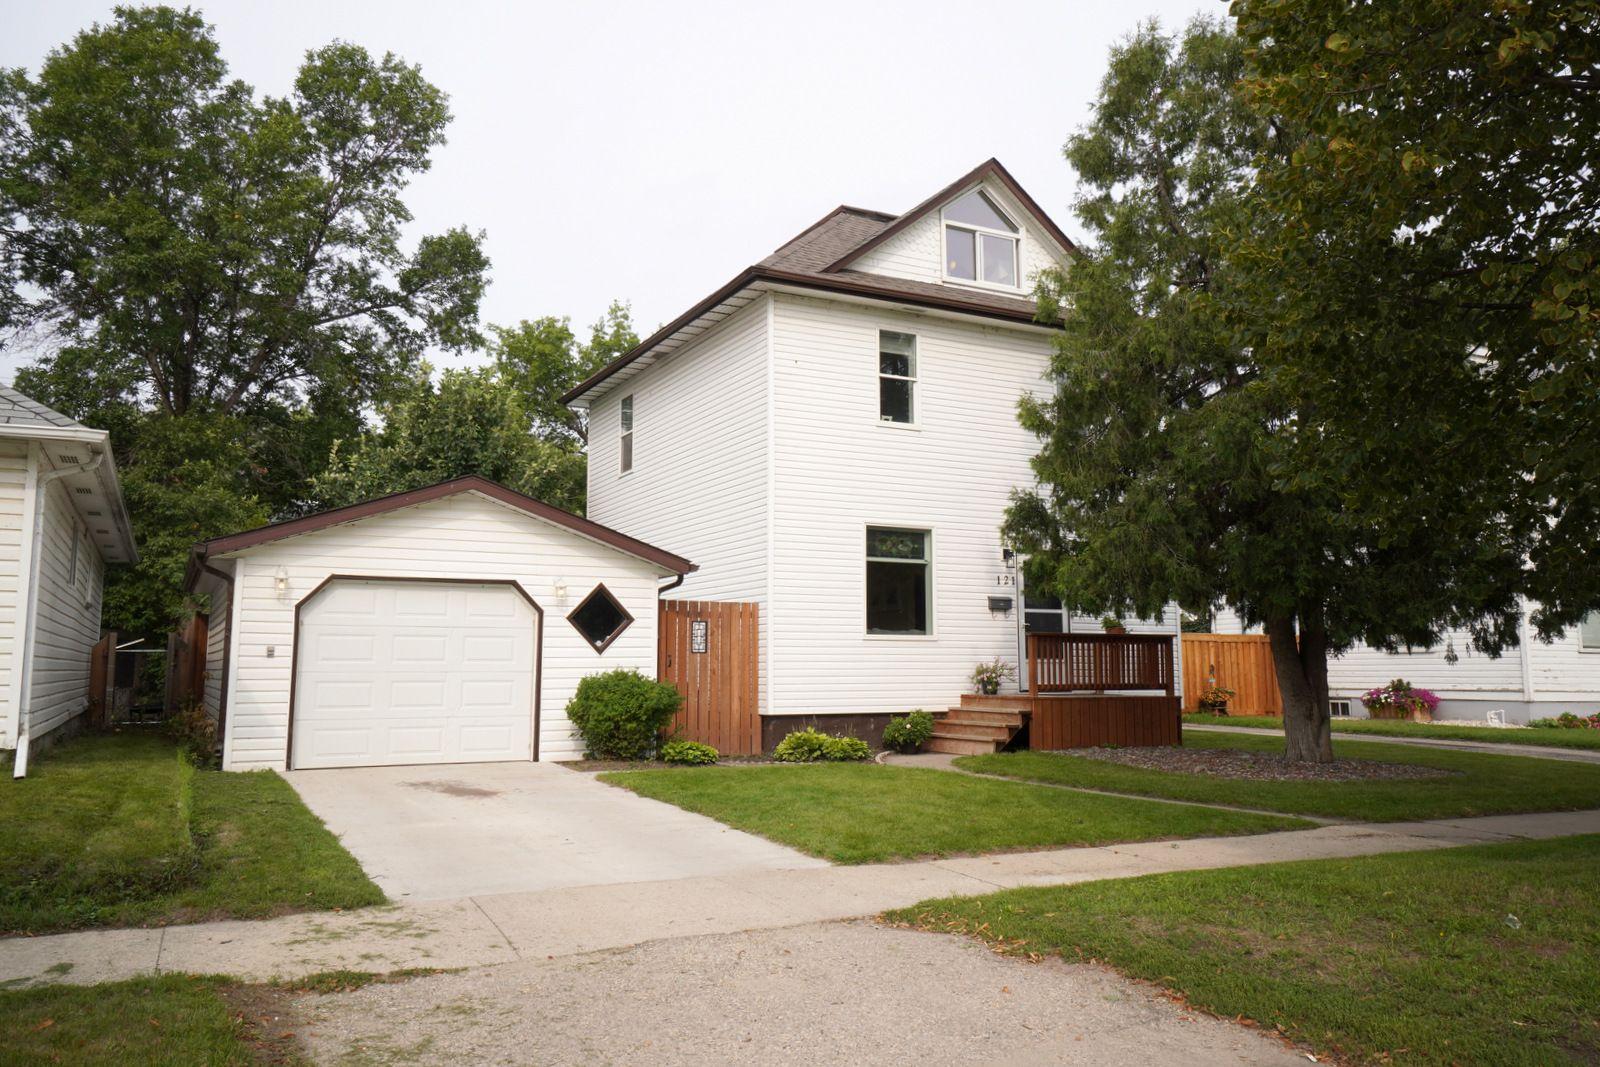 Main Photo: 121 5th St SE in Portage la Prairie: House for sale : MLS®# 202121621